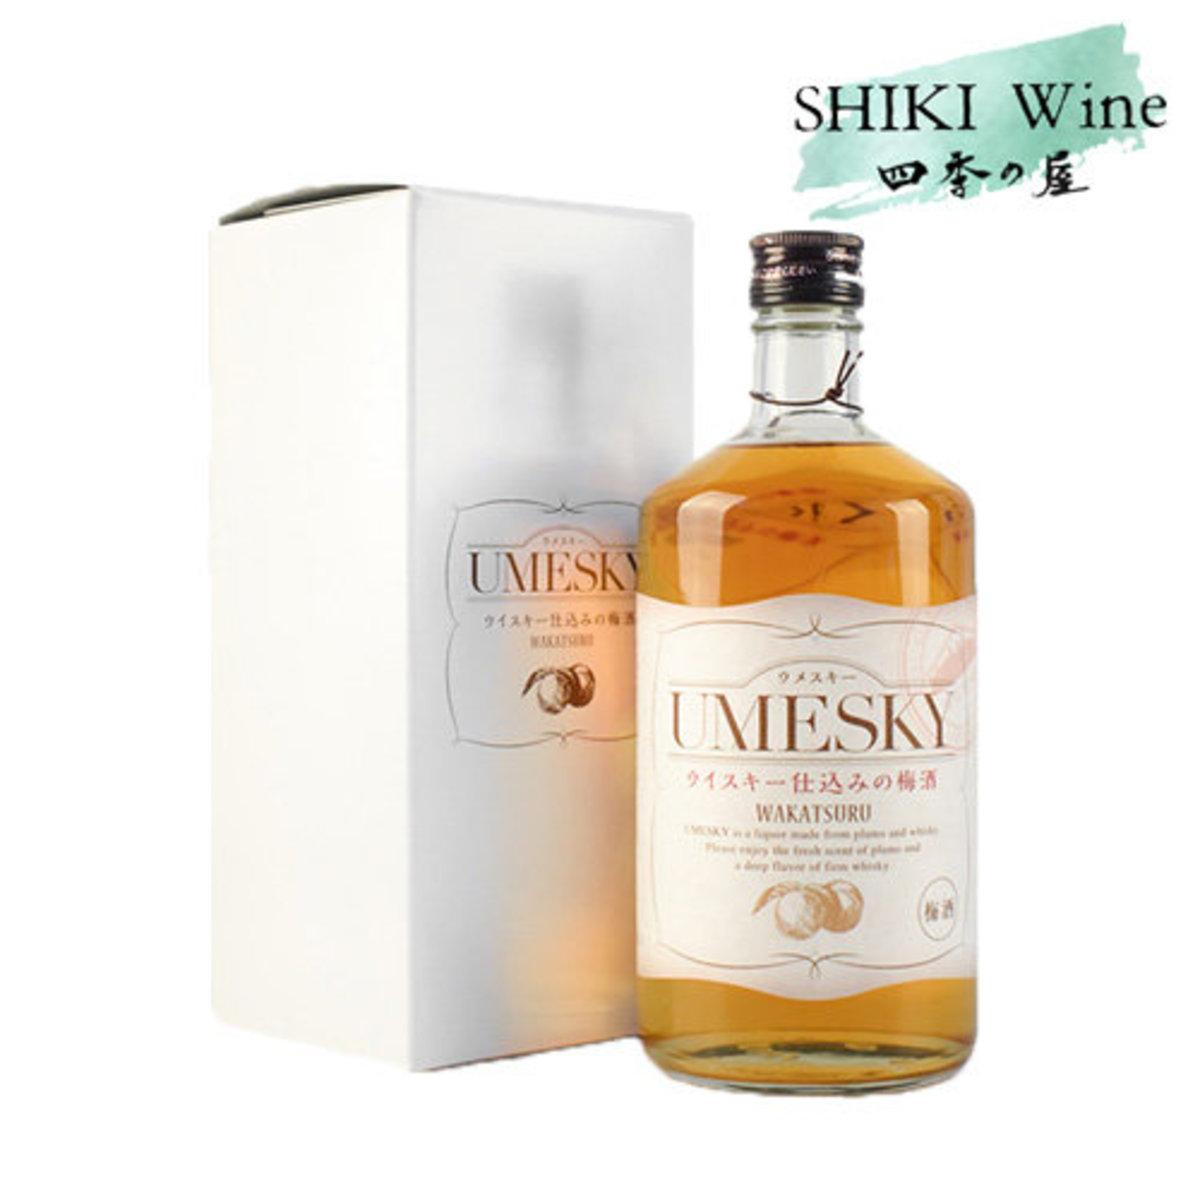 UMESKY威士忌梅酒 720ml